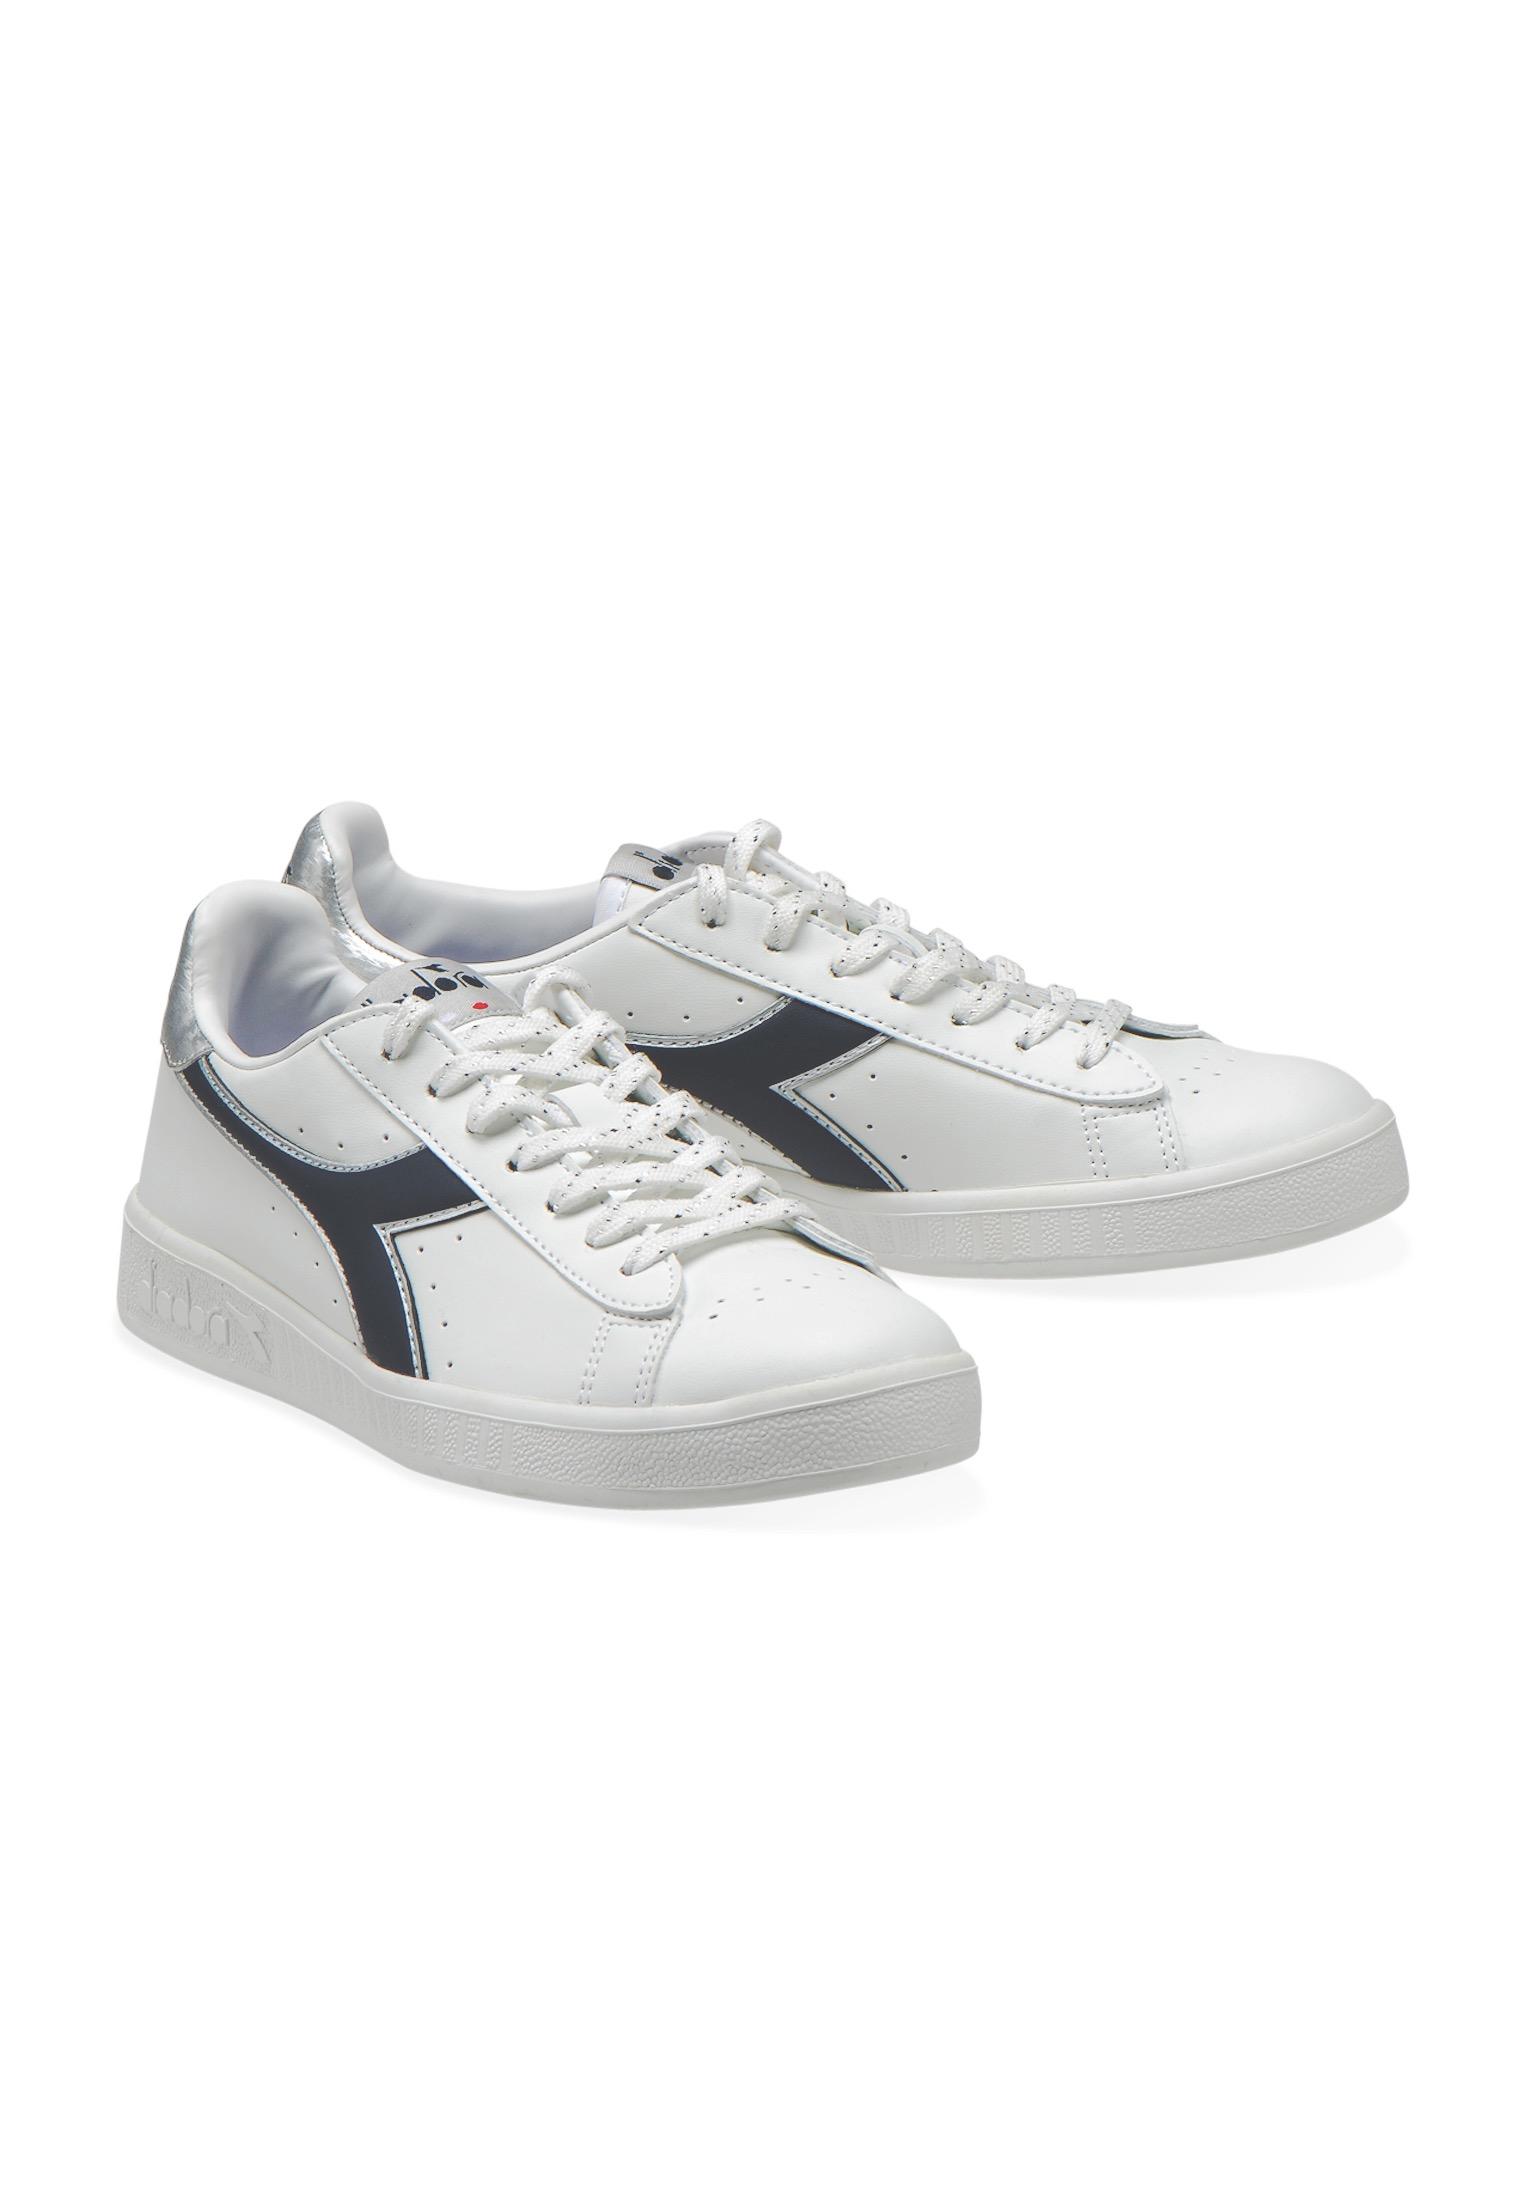 Diadora-Sneakers-GAME-P-WN-para-hombre-y-mujer miniatura 29